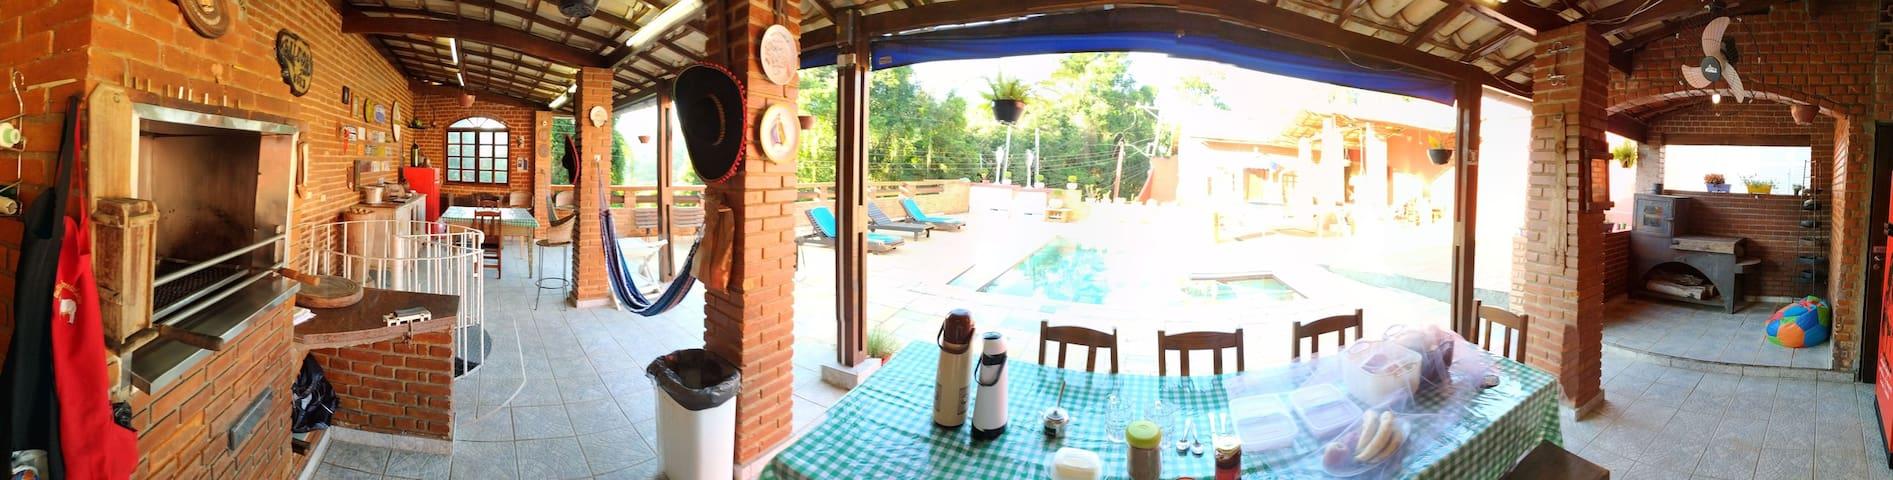 Aluguel Casa de Campo piscina p/ Festas e Eventos